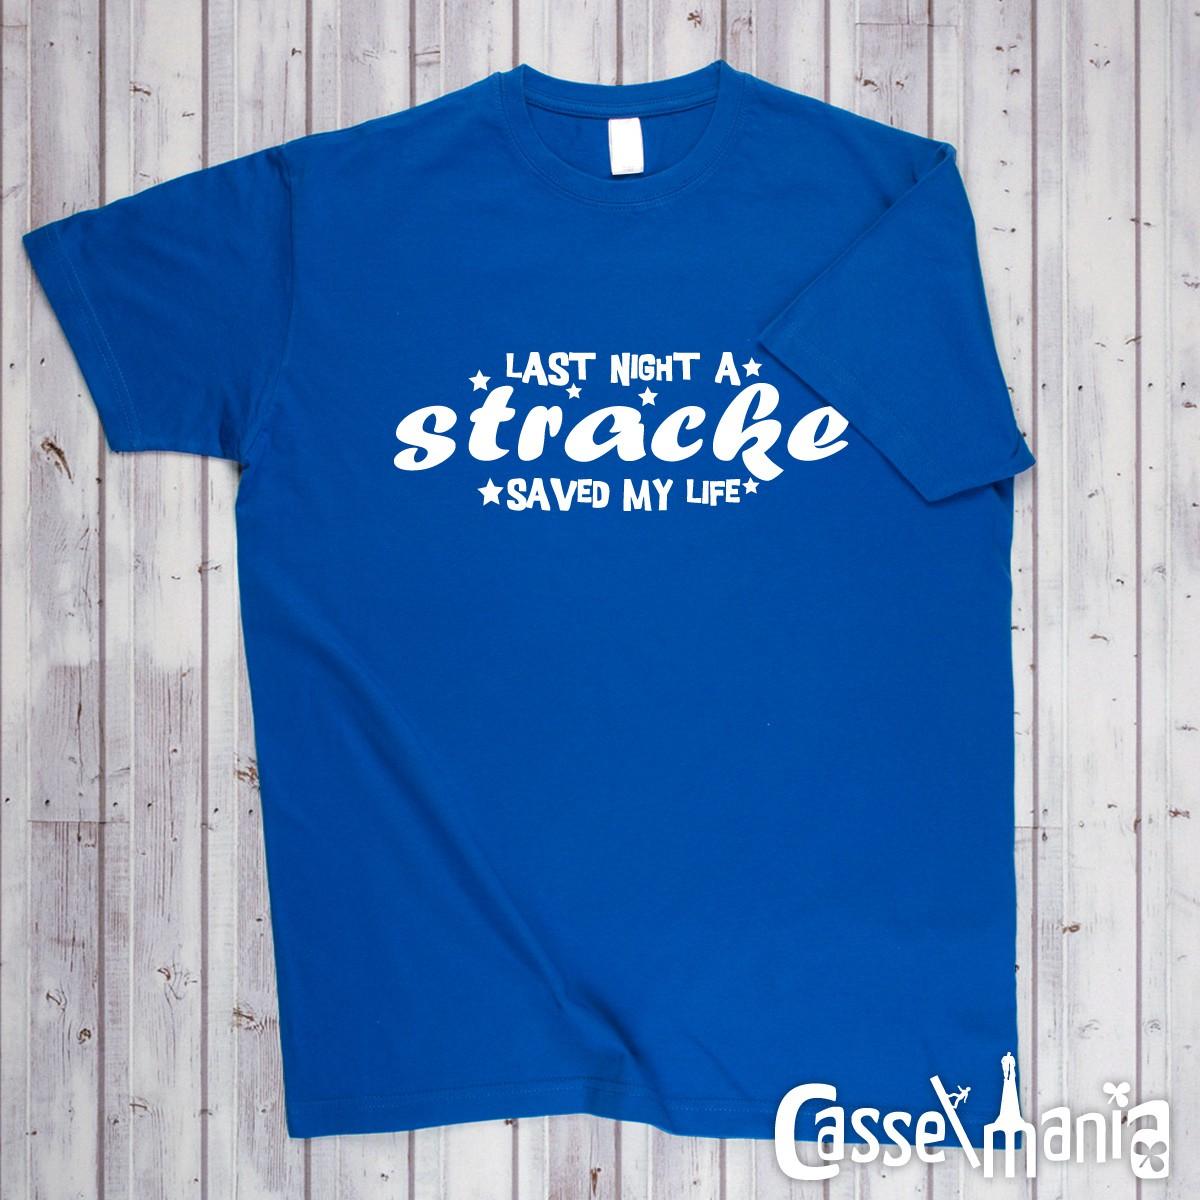 Last night a Stracke saved my life! - Unisex